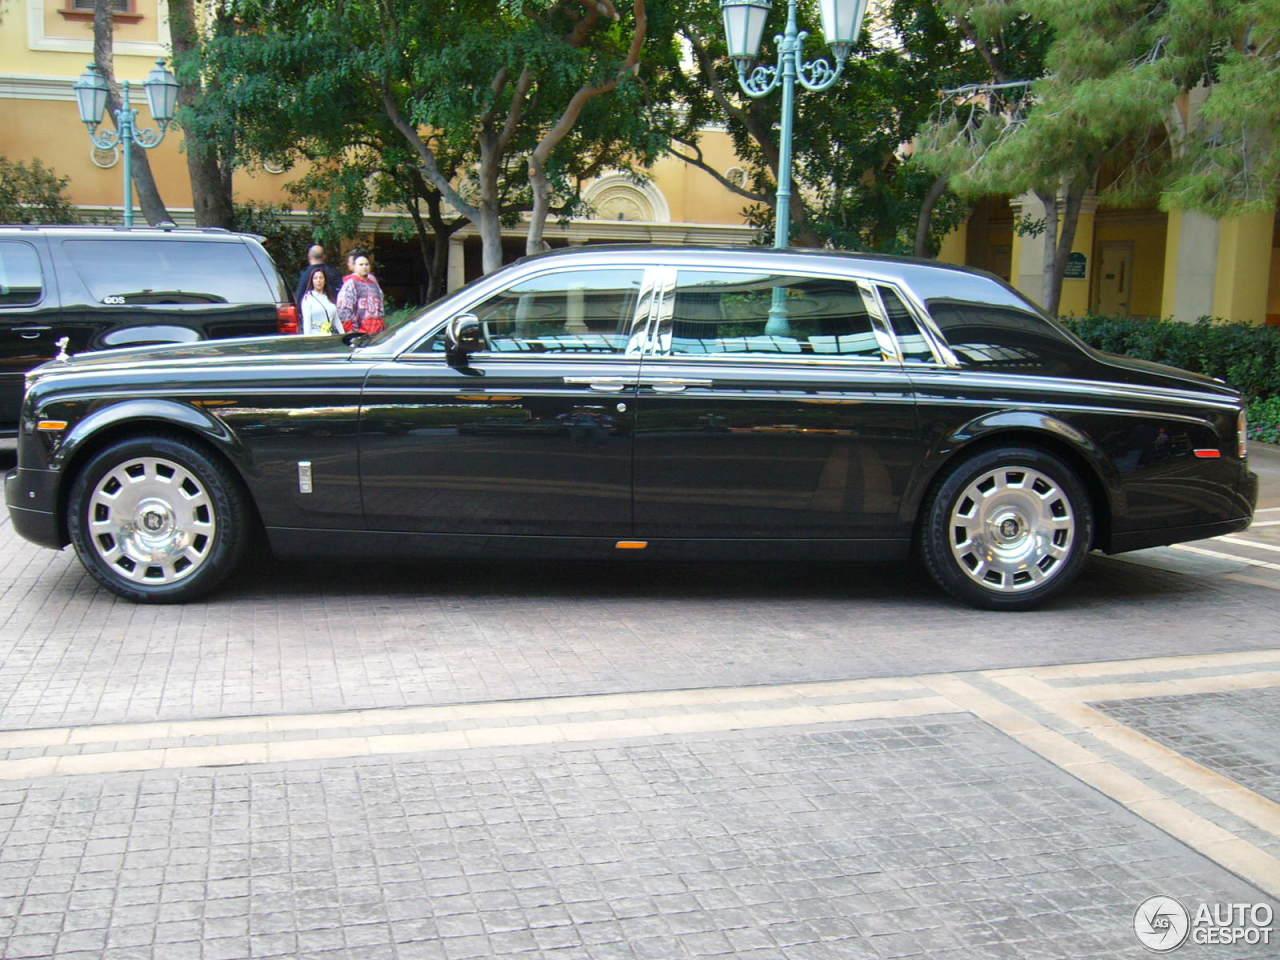 Rolls Royce Phantom Ewb Series Ii 6 December 2014